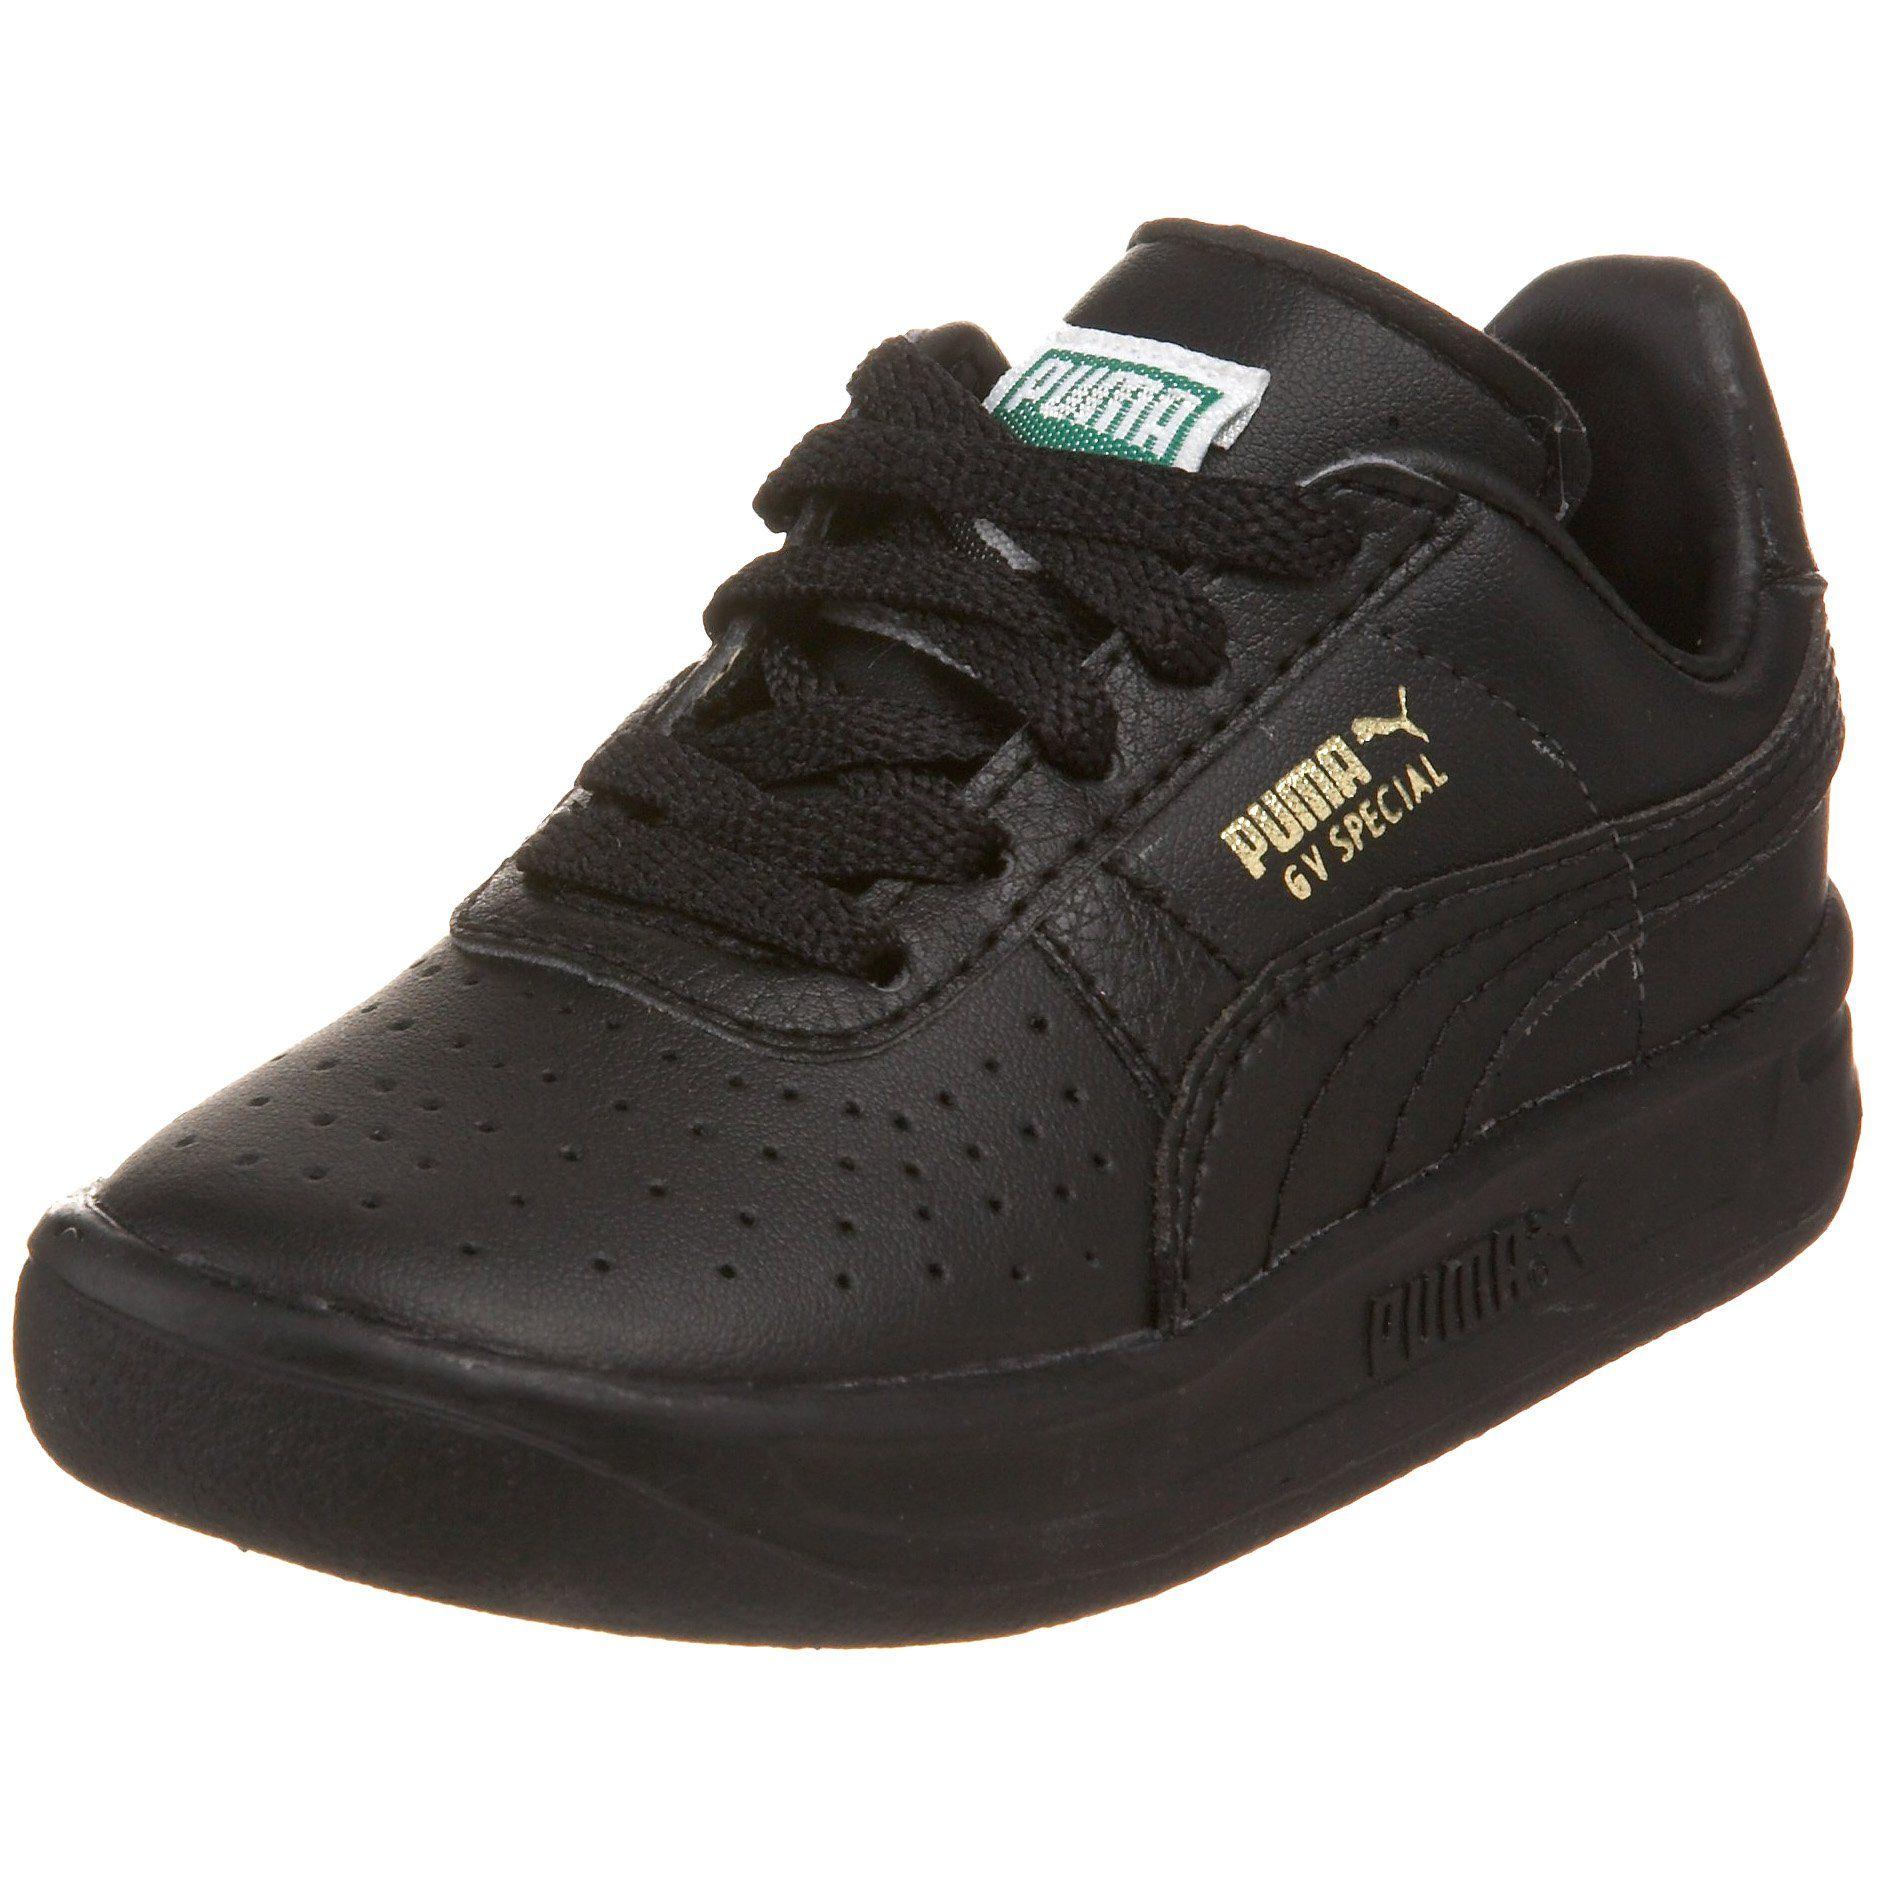 PUMA GV Special Kids Sneaker , Black/Black/Metallic Gold